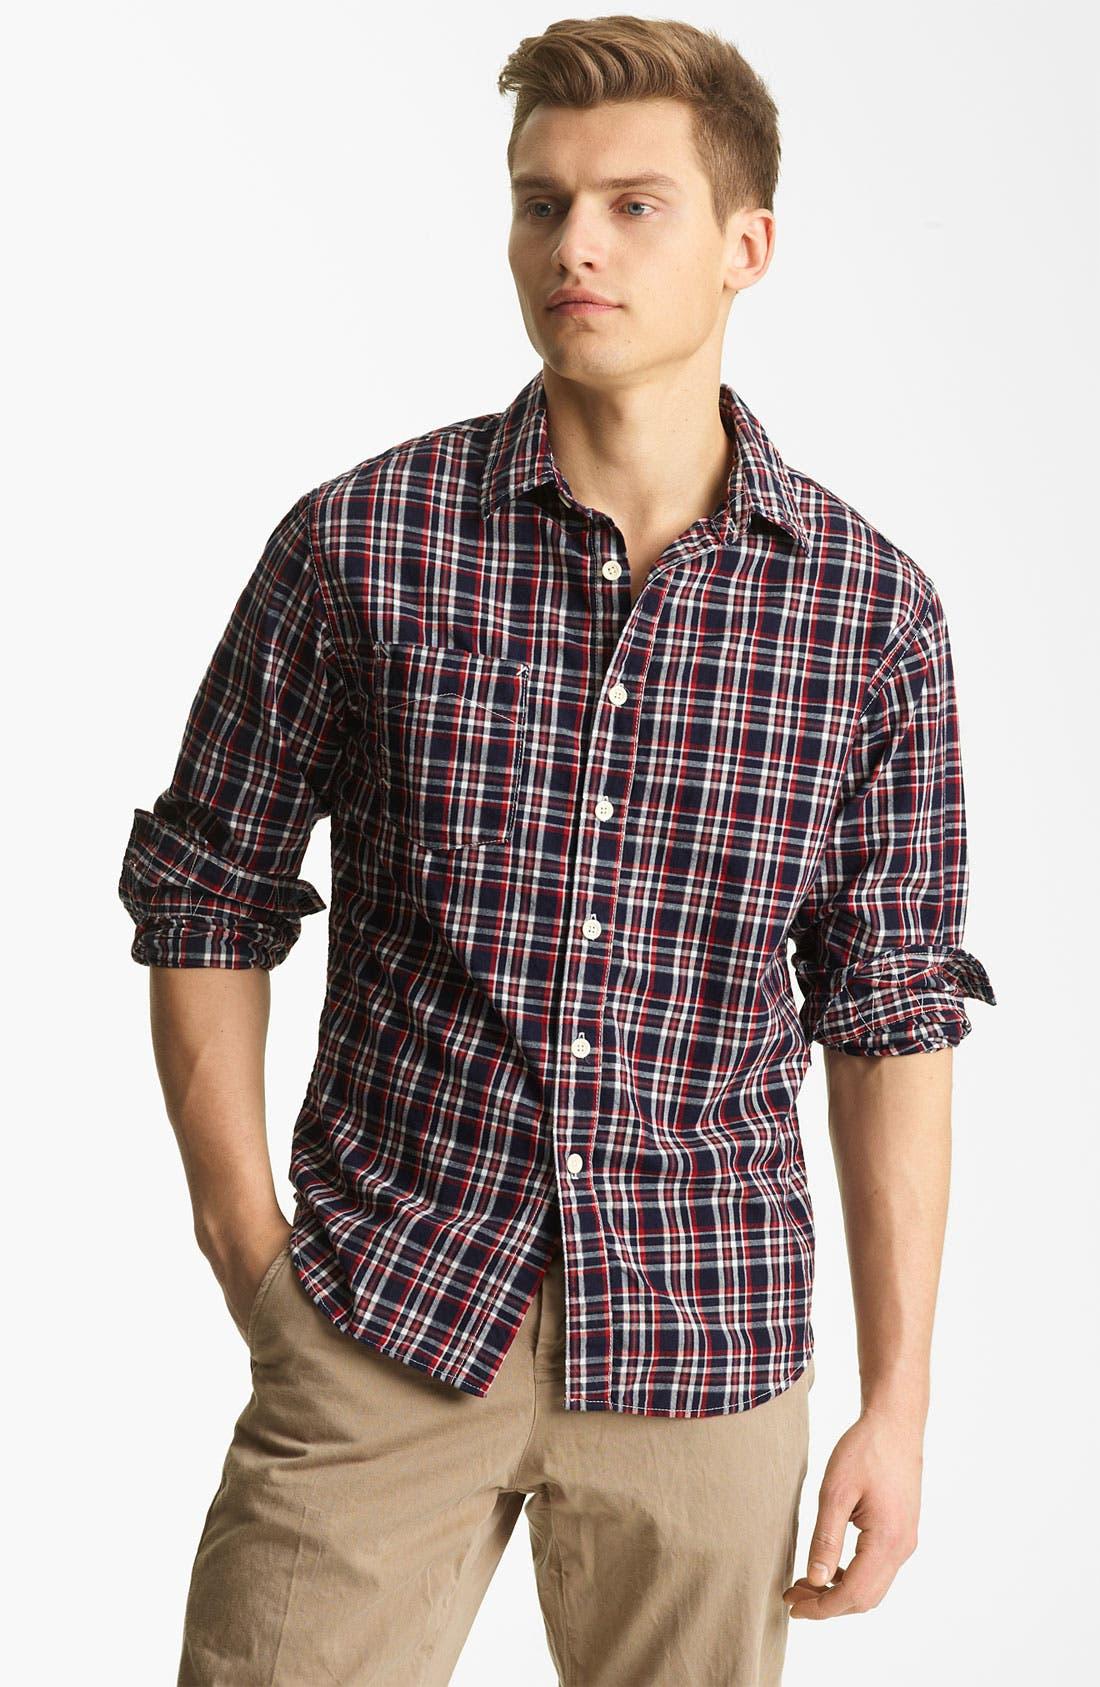 Alternate Image 1 Selected - Billy Reid 'Elkins' Plaid Woven Shirt